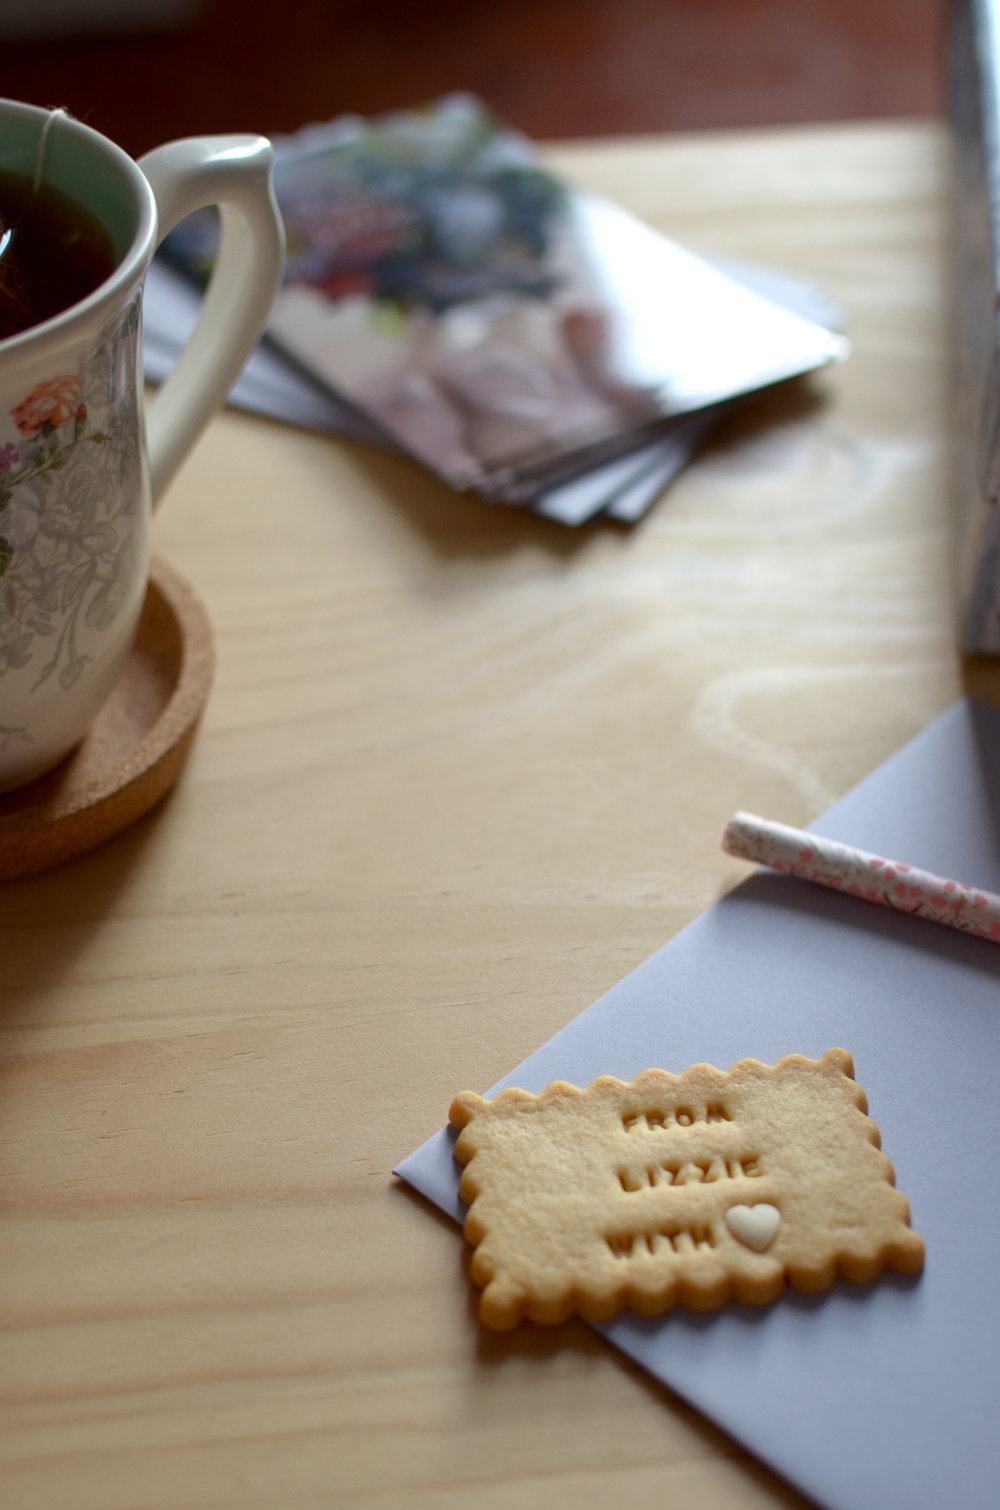 twinky lizzy blog aix en provence - shanty biscuits 10.jpg